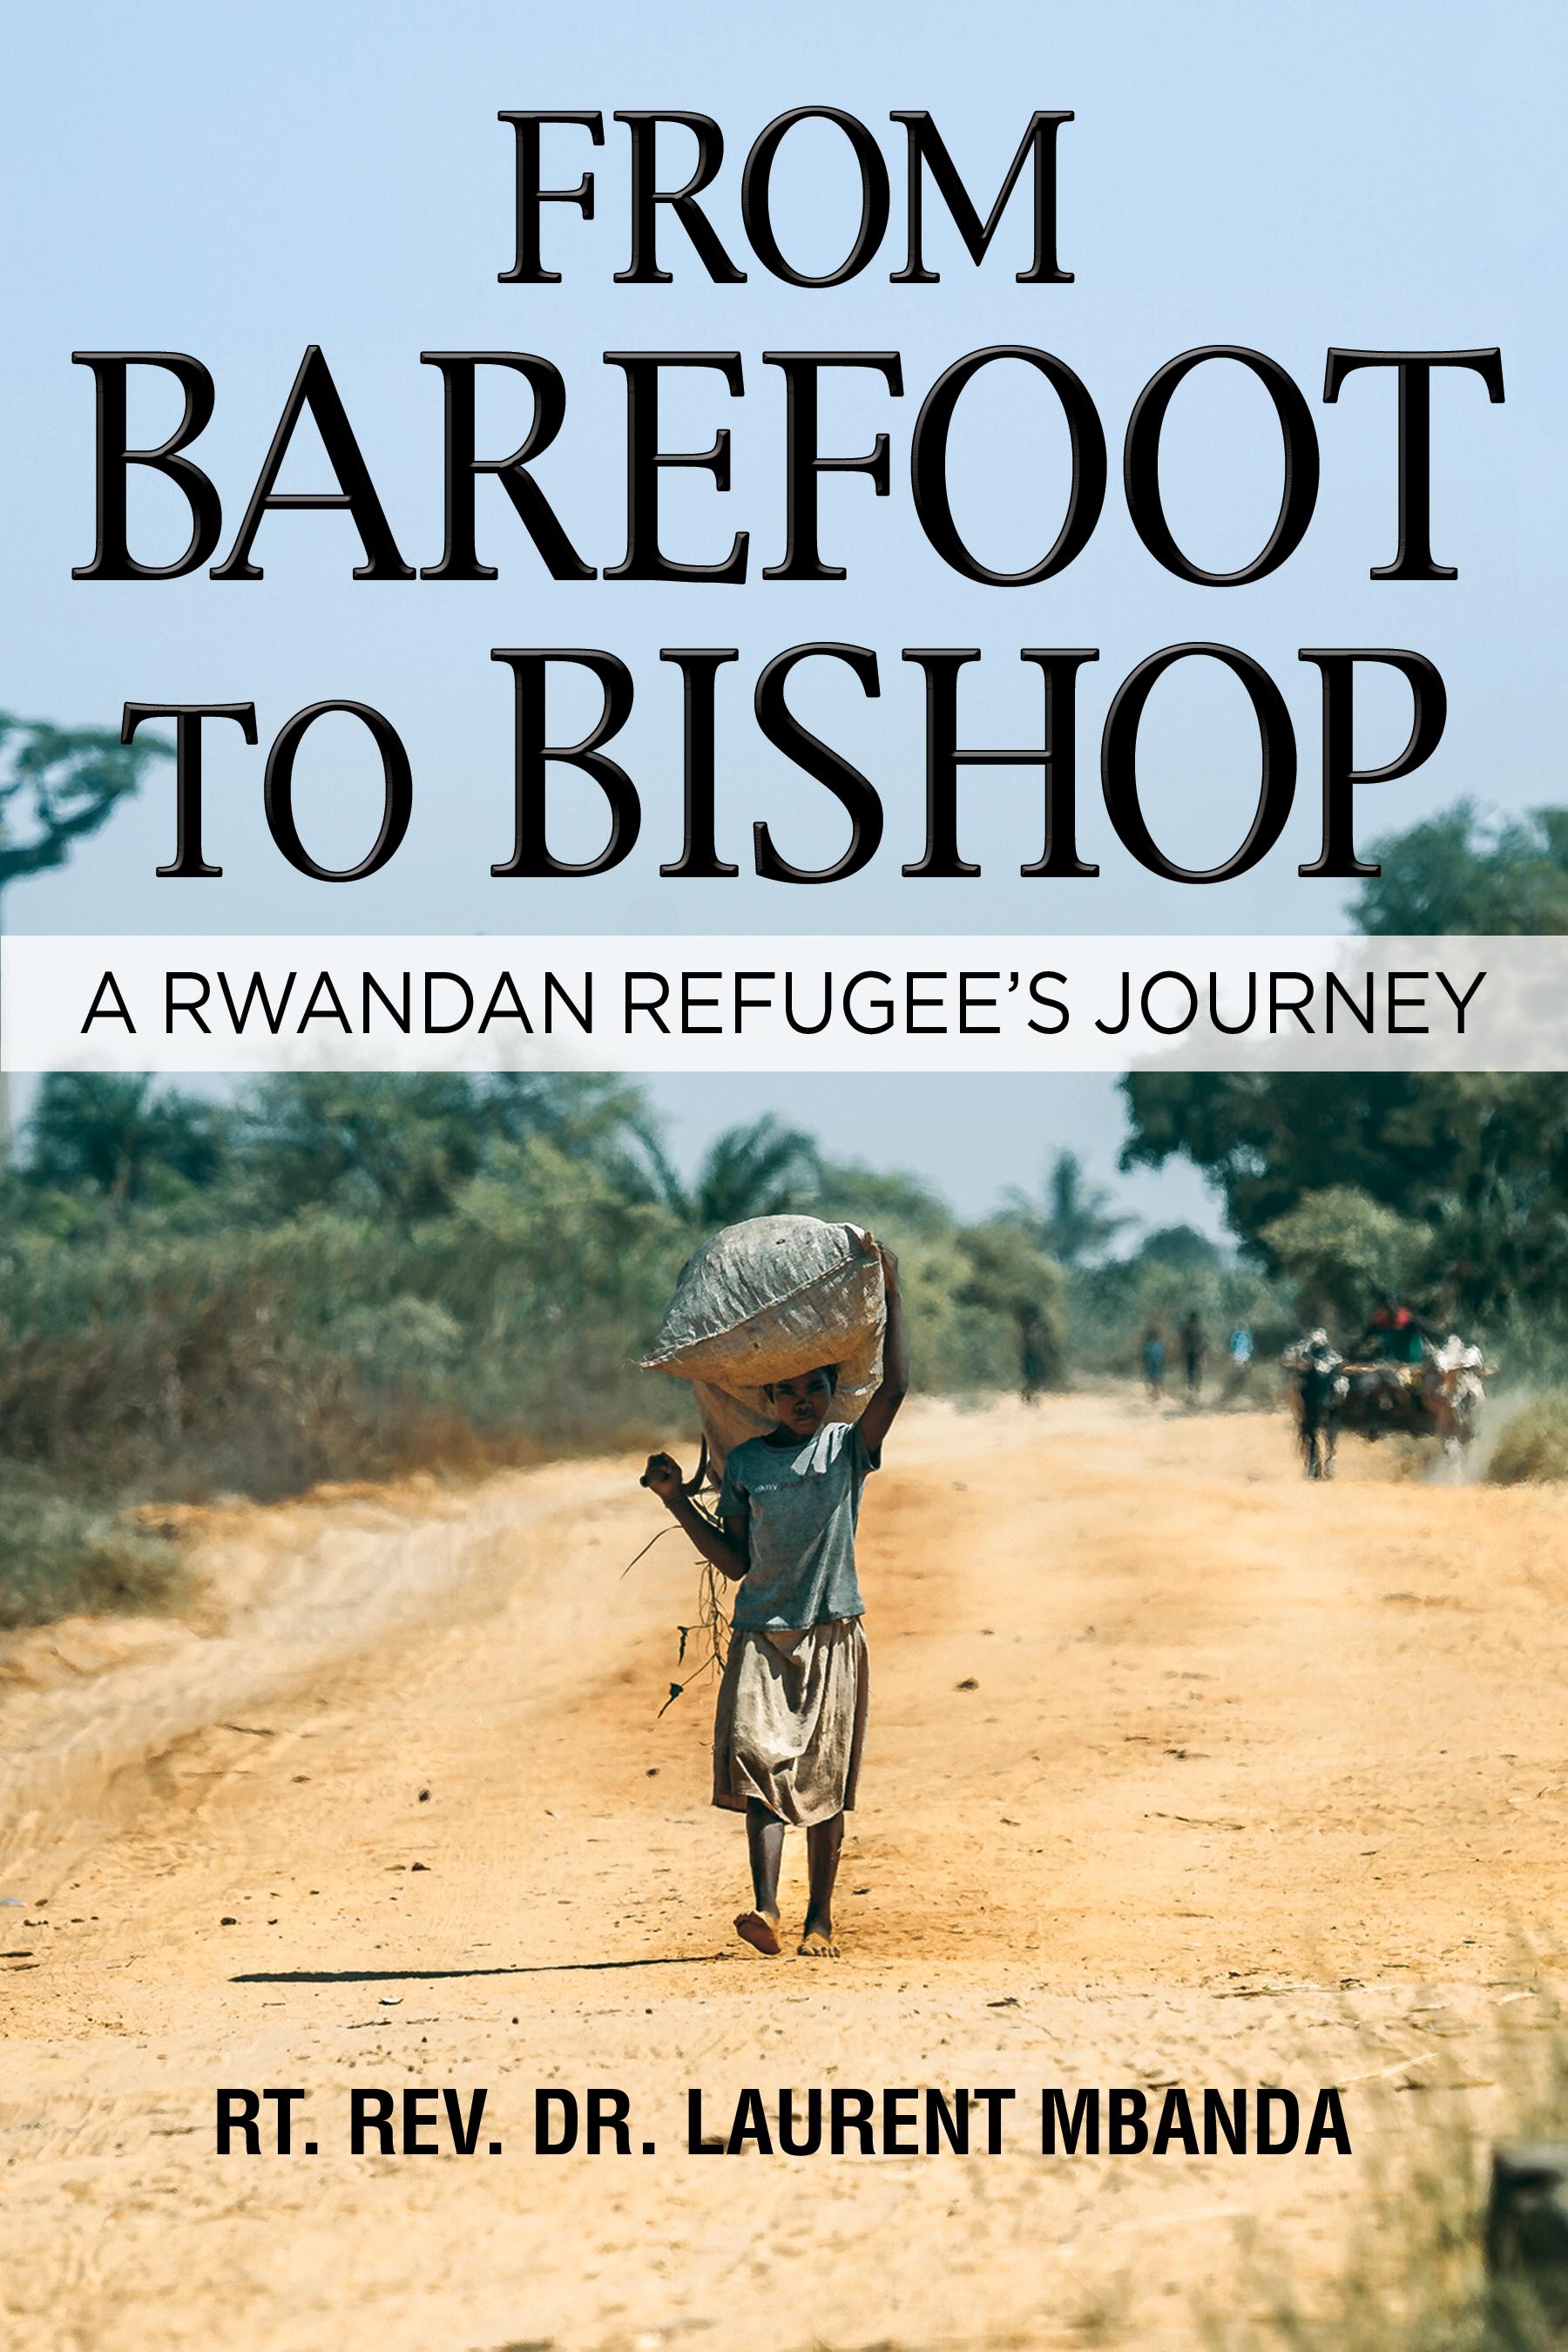 From Barefoot To Bishop A Rwandan Refugee Journey.jpg